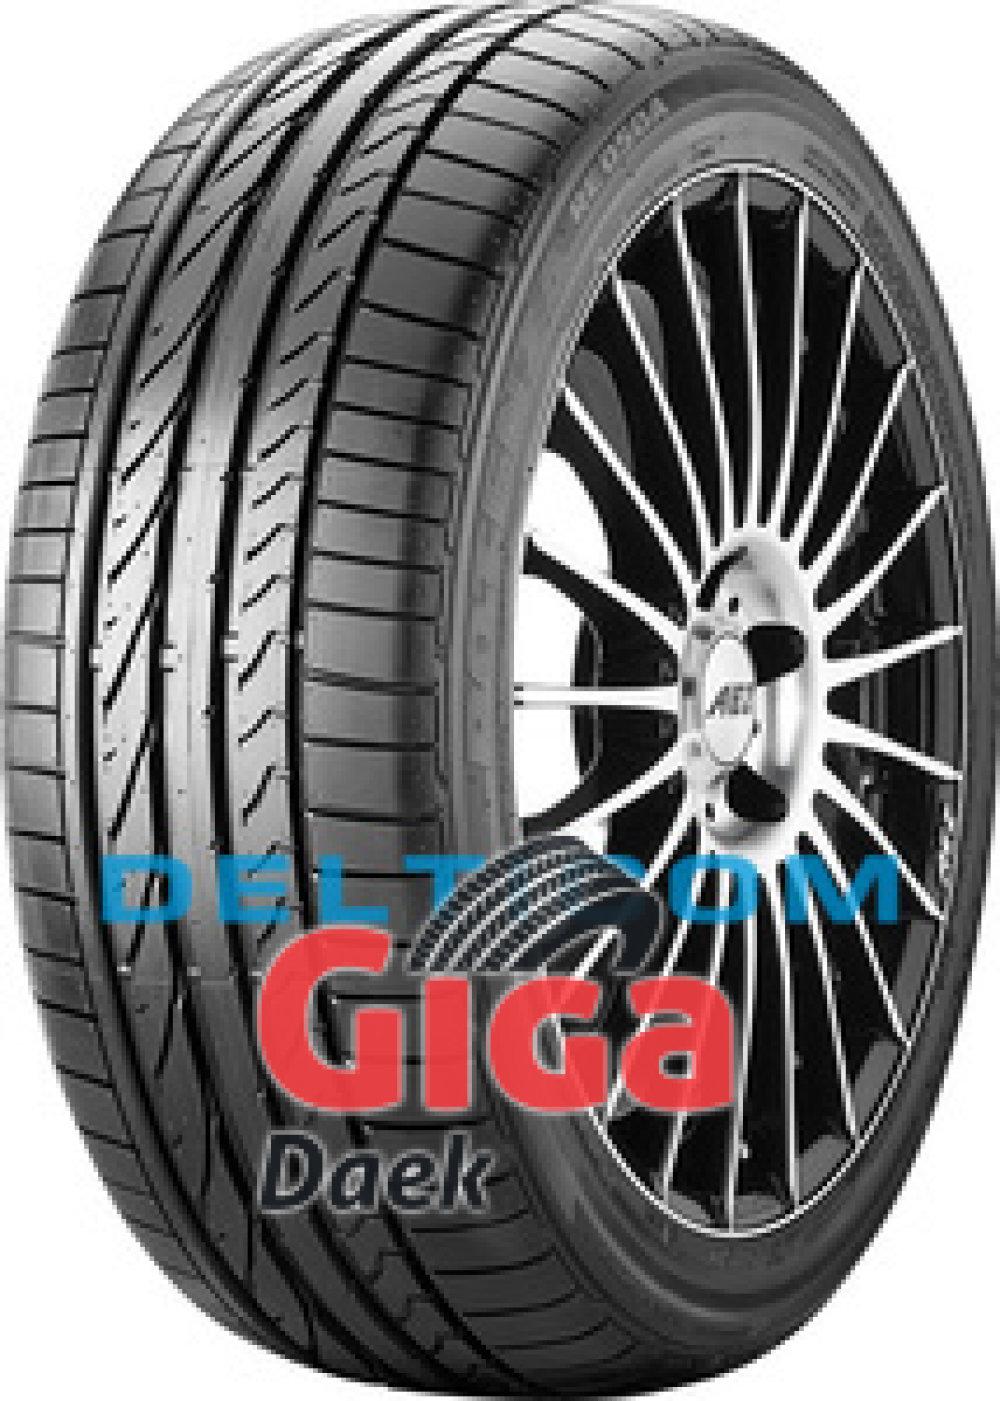 Bridgestone Potenza RE 050 A EXT ( 255/40 R18 95Y MOE, runflat )